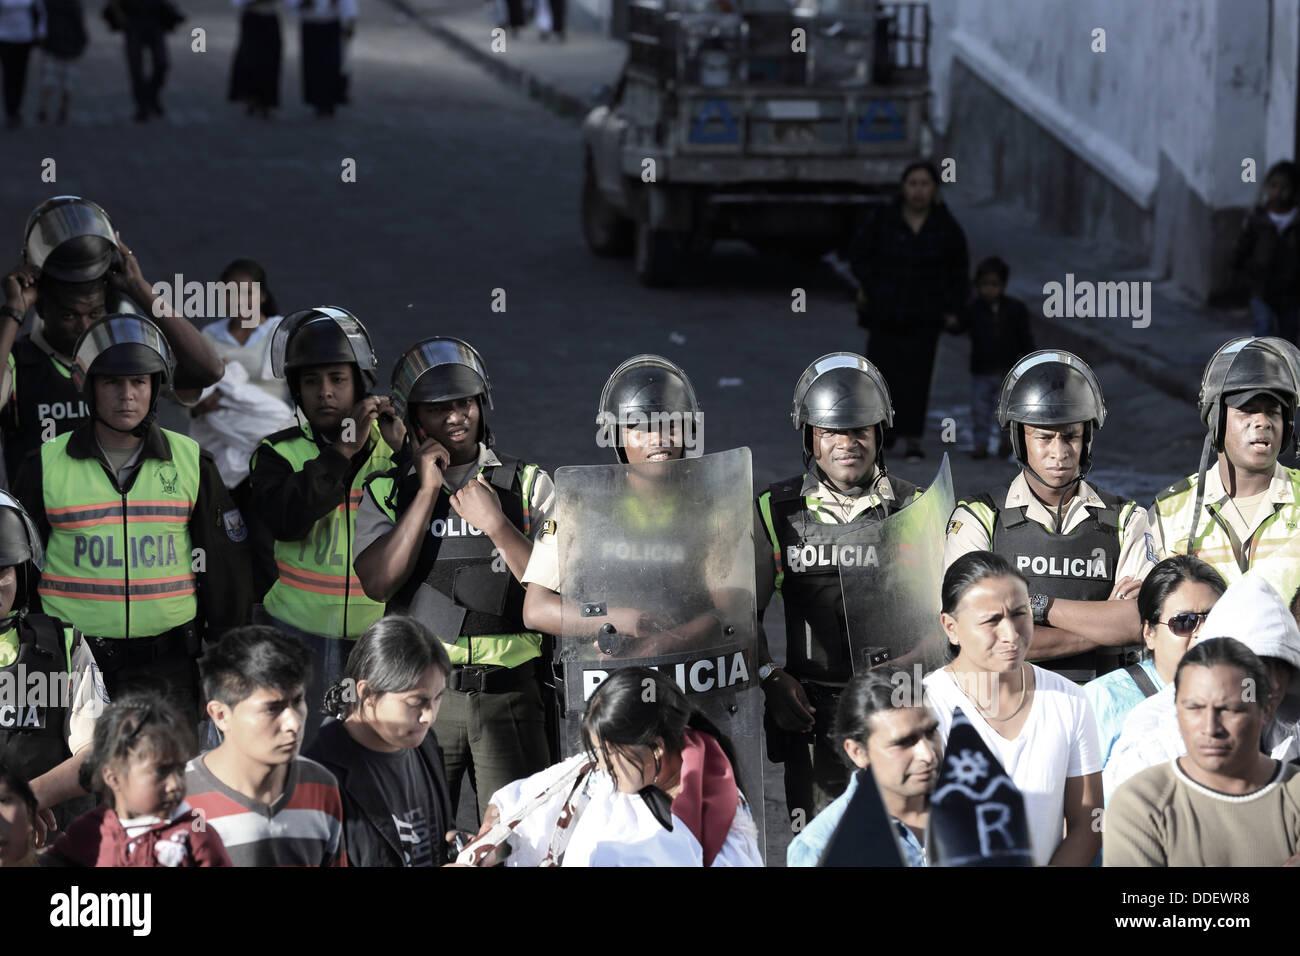 Riot police watch proceedings during Inti Raymi festivities in Cotacachi, Ecuador - Stock Image